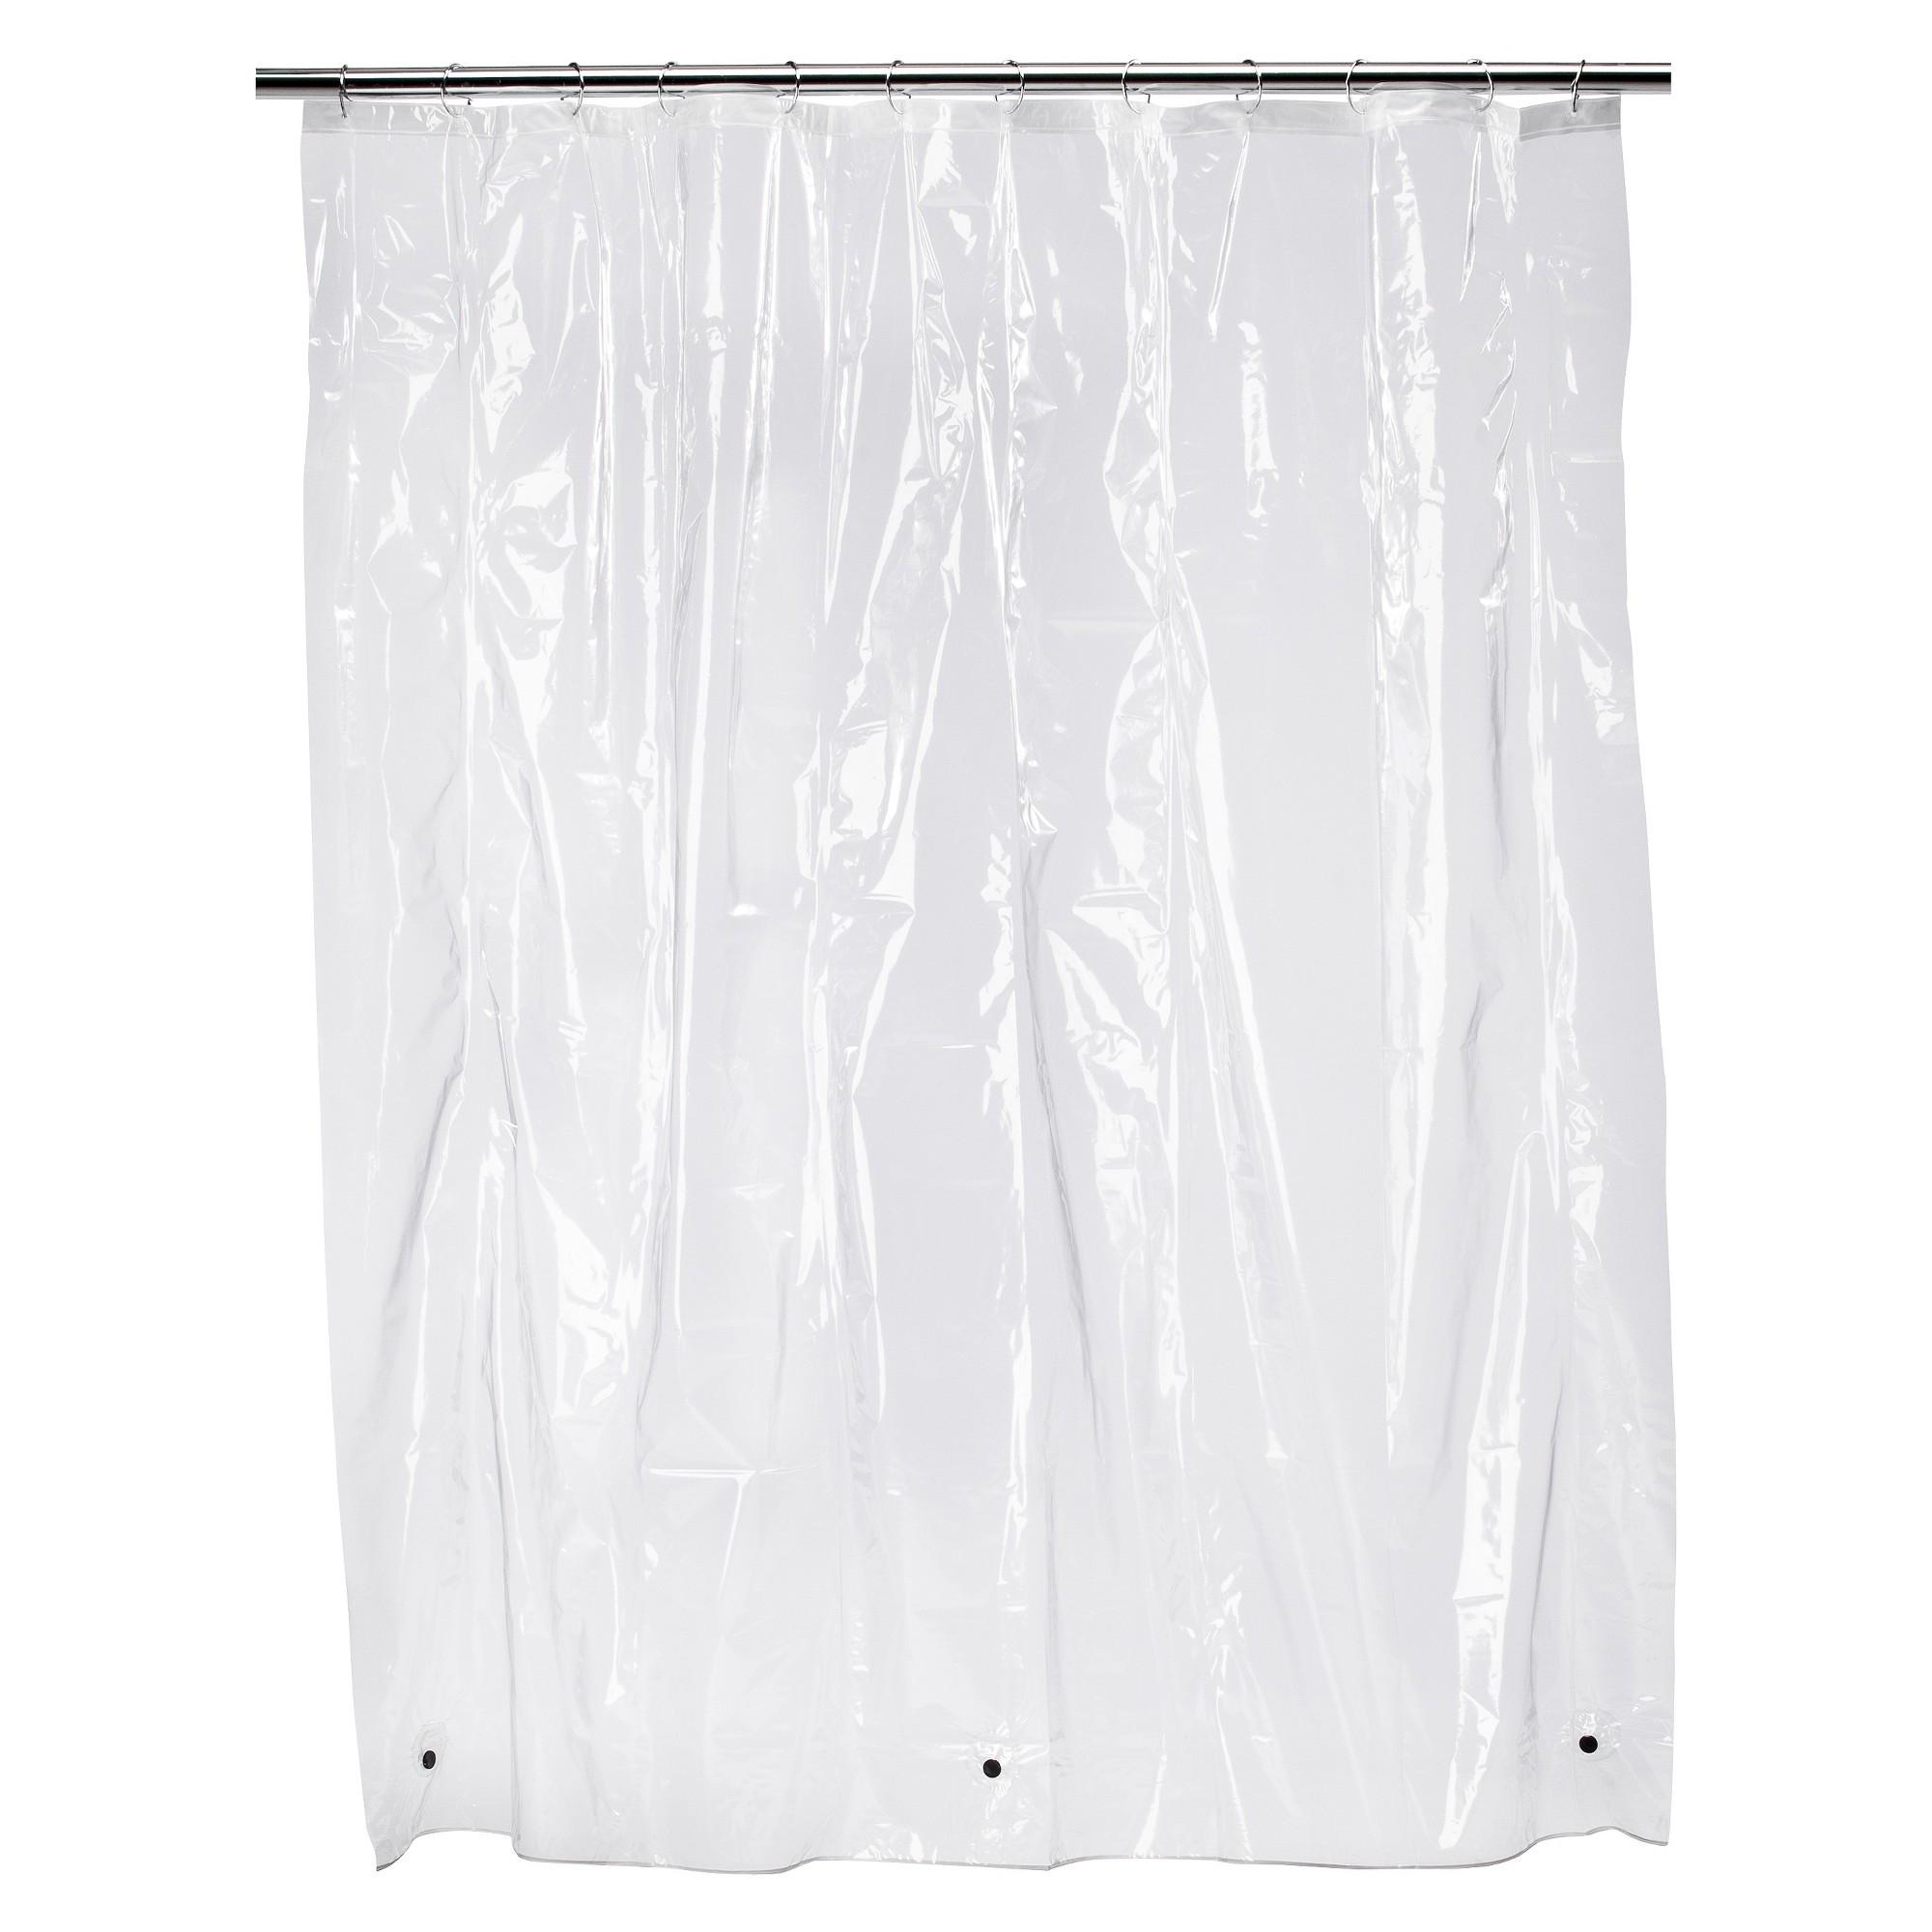 Solid Super Soft PEVA Shower Liner Clear - Room Essentials